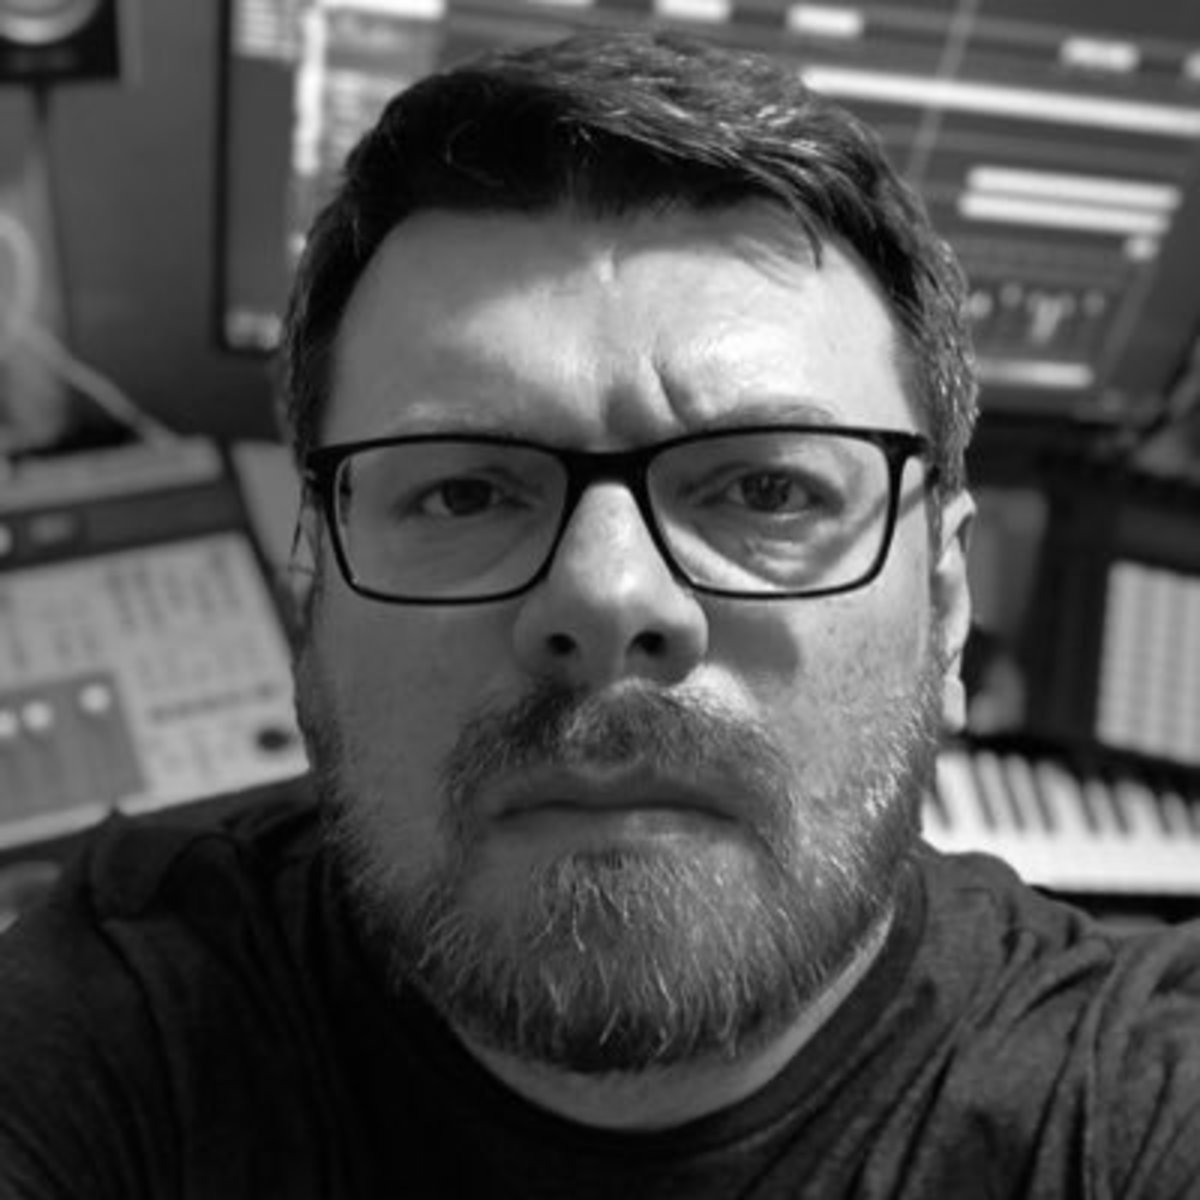 #Synthfam Interview: Looney Jetman